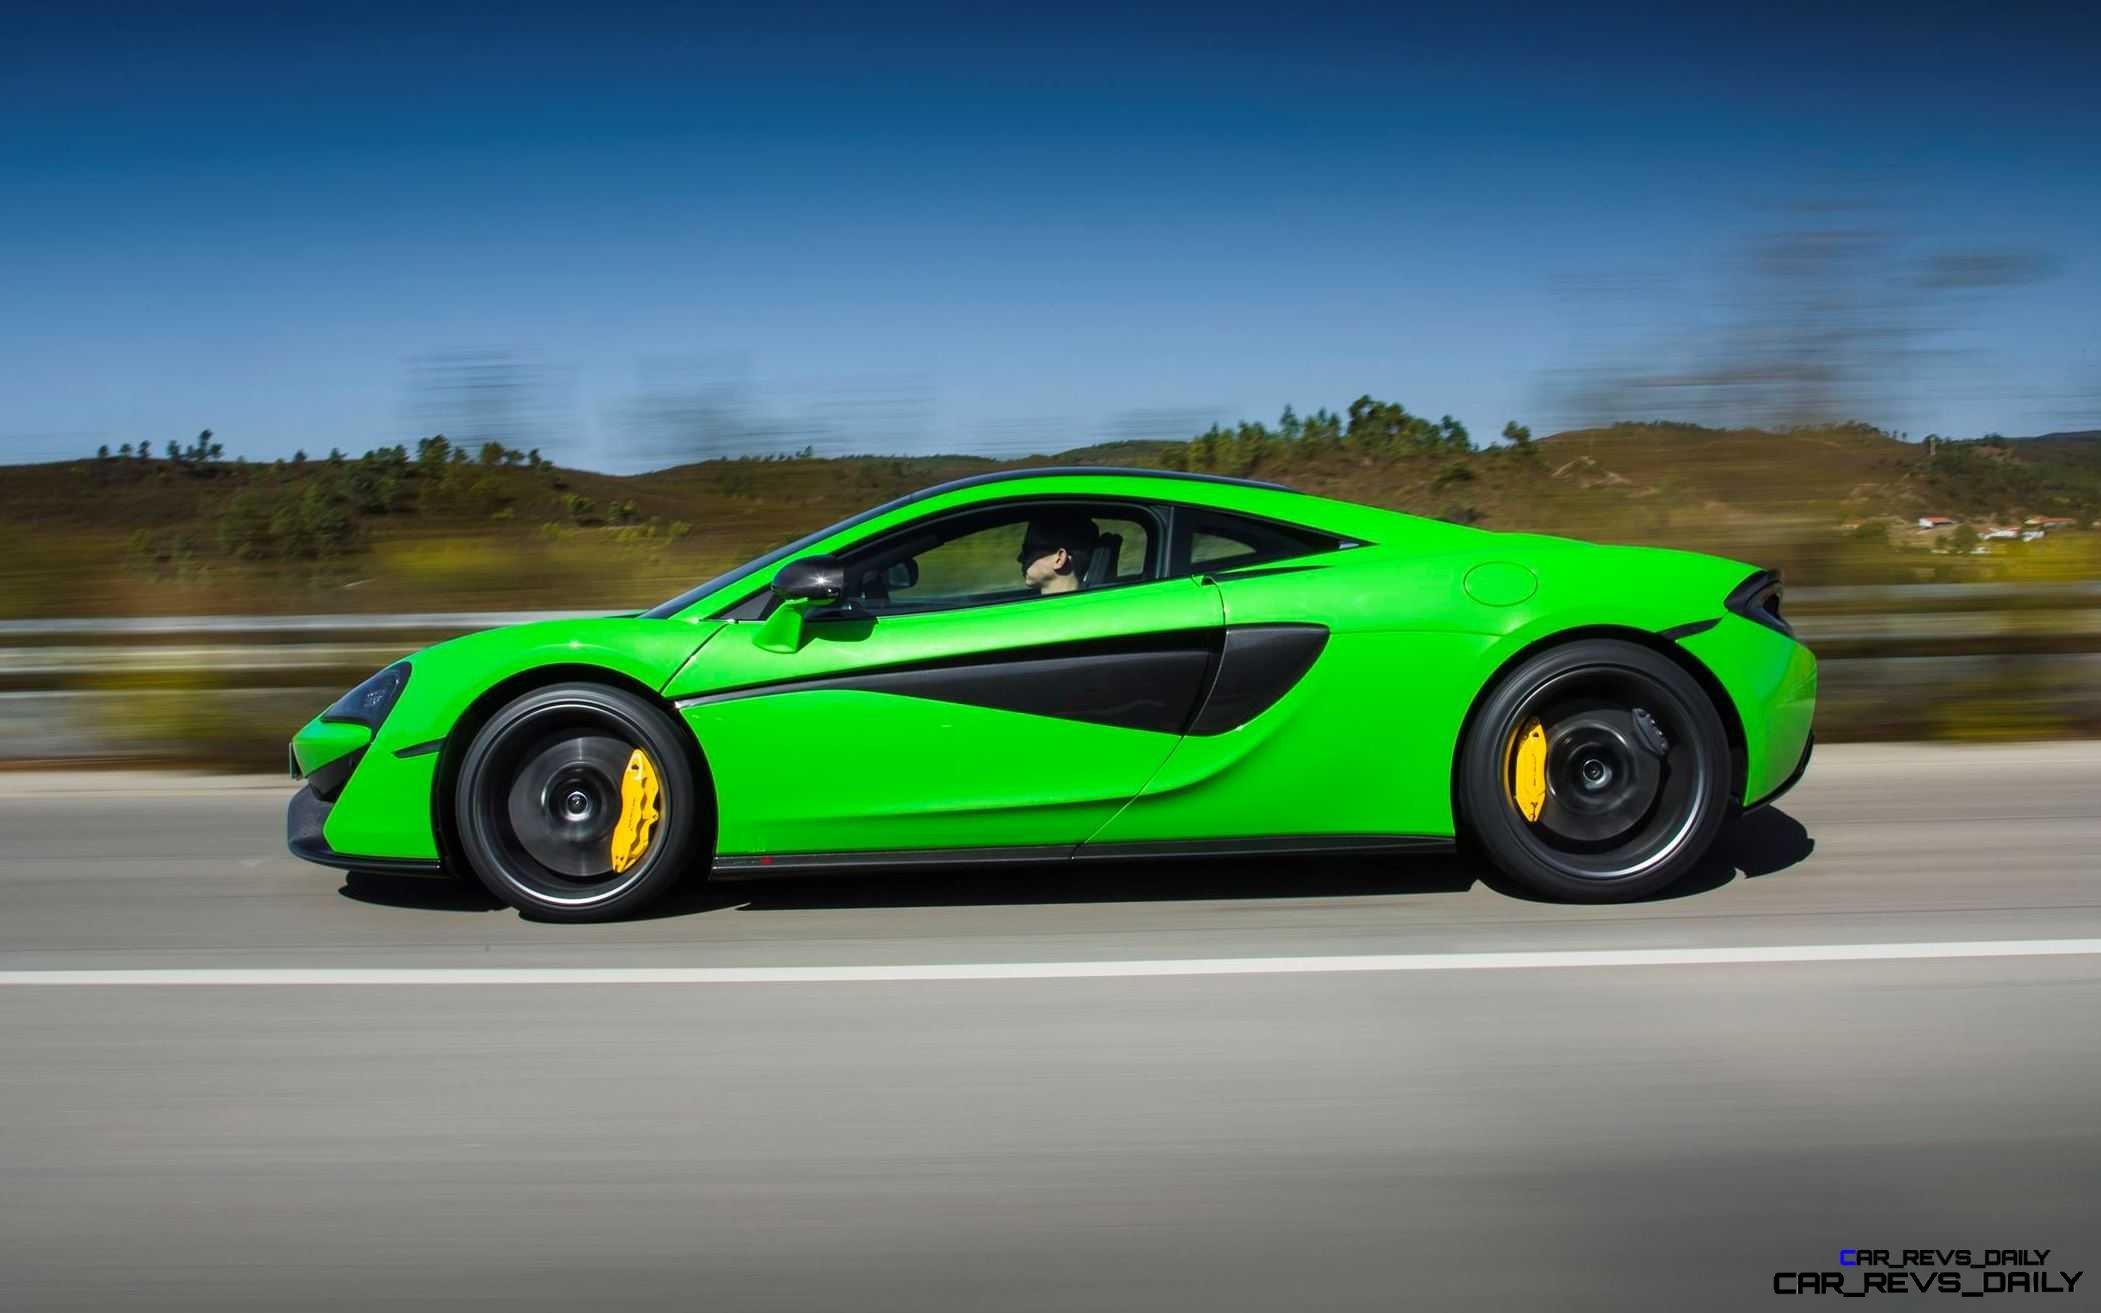 http://www.car-revs-daily.com/wp-content/uploads/2015/10/5857McLaren-570S-Coupe-Mantis-Green-008.jpg